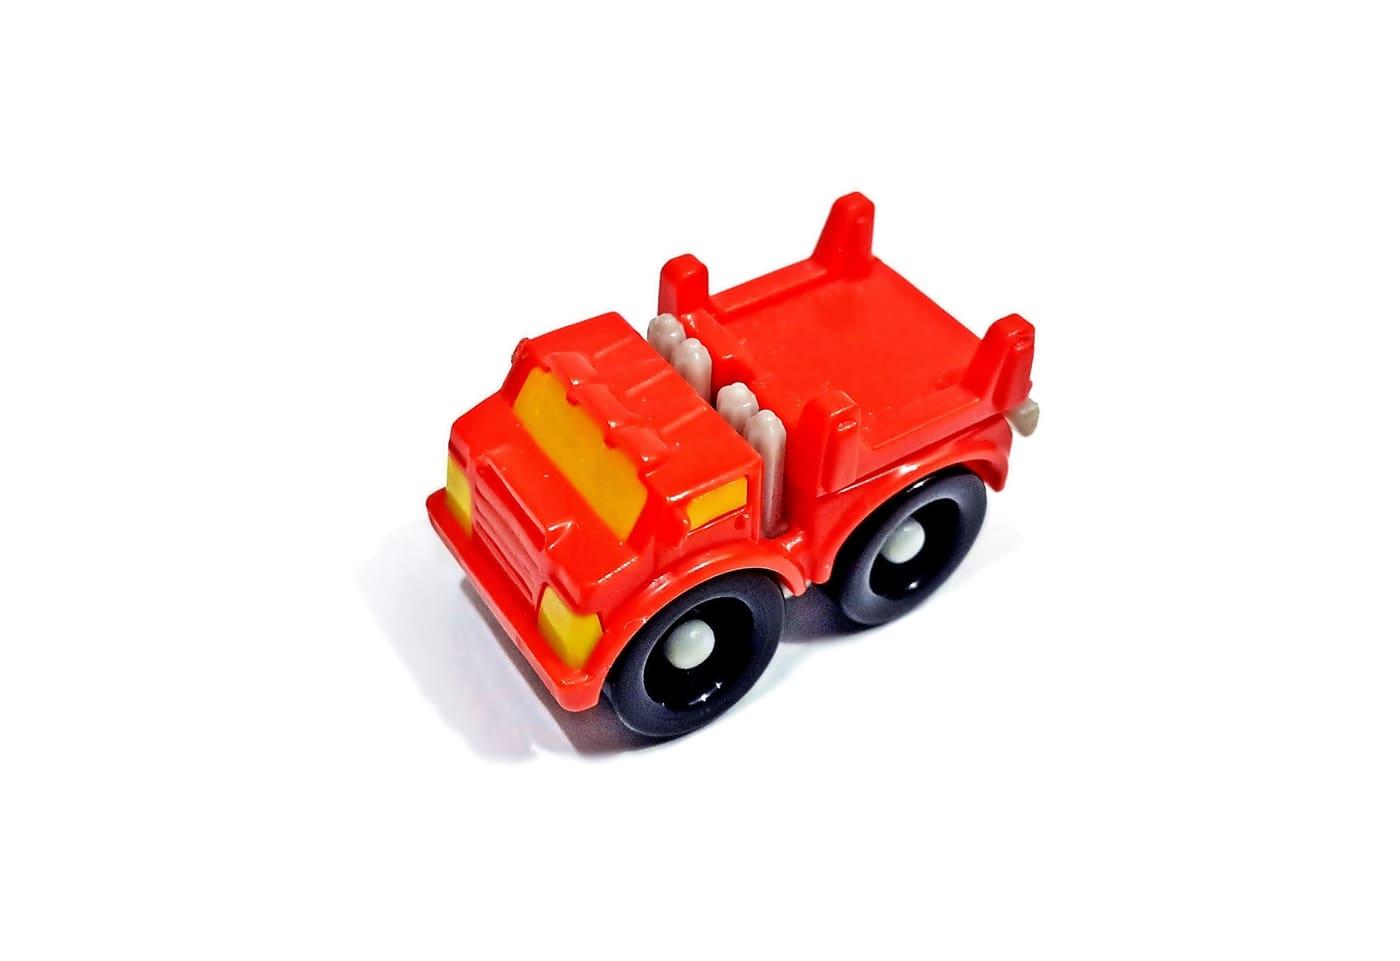 Red Toy Truck, Fun, Miniature, Macro